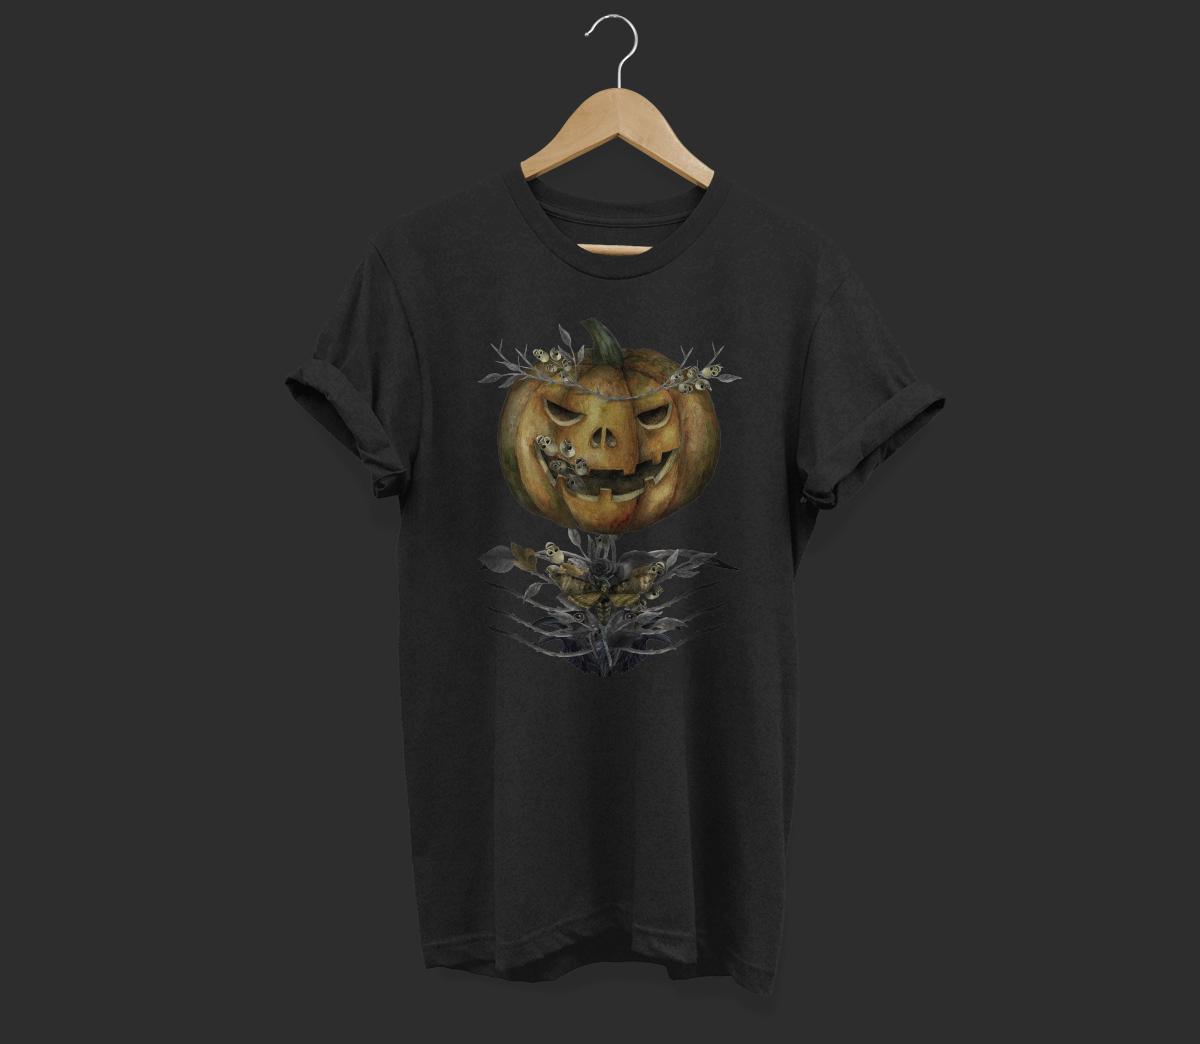 Jack o Lanter Halloween clipart, evil vintage gothic pumpkin example image 3